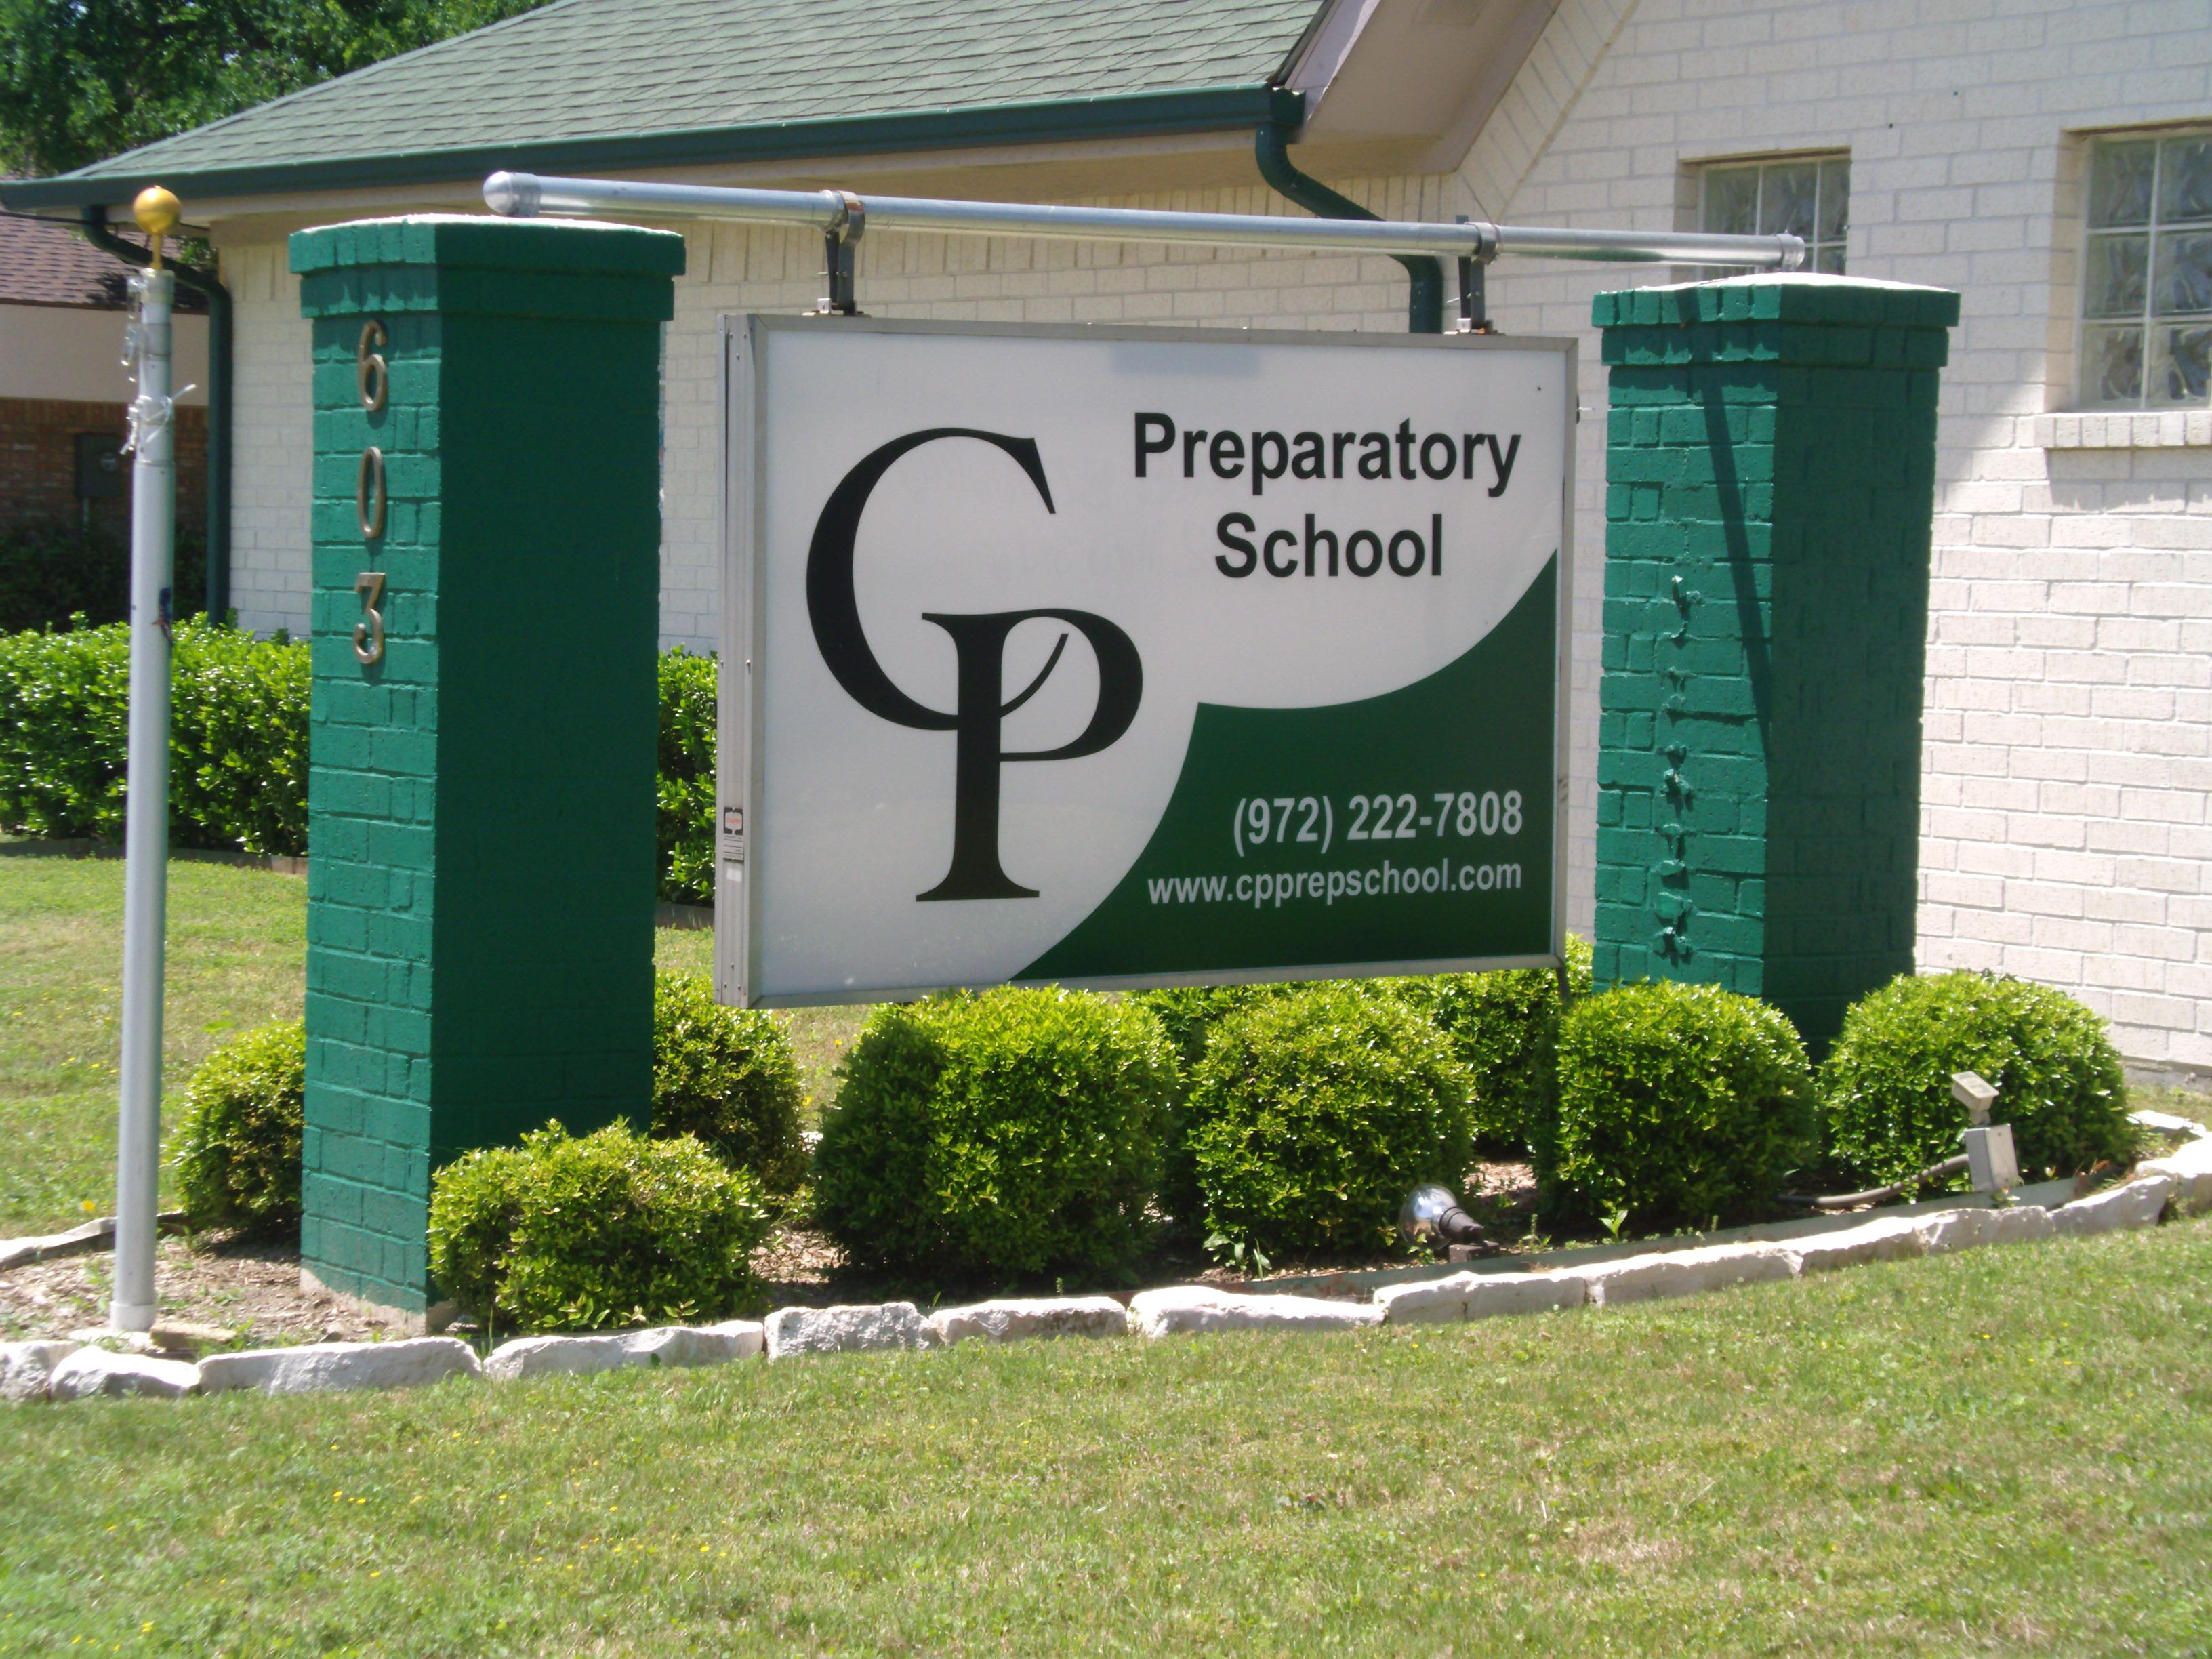 CP Preparatory School - Mesquite, TX